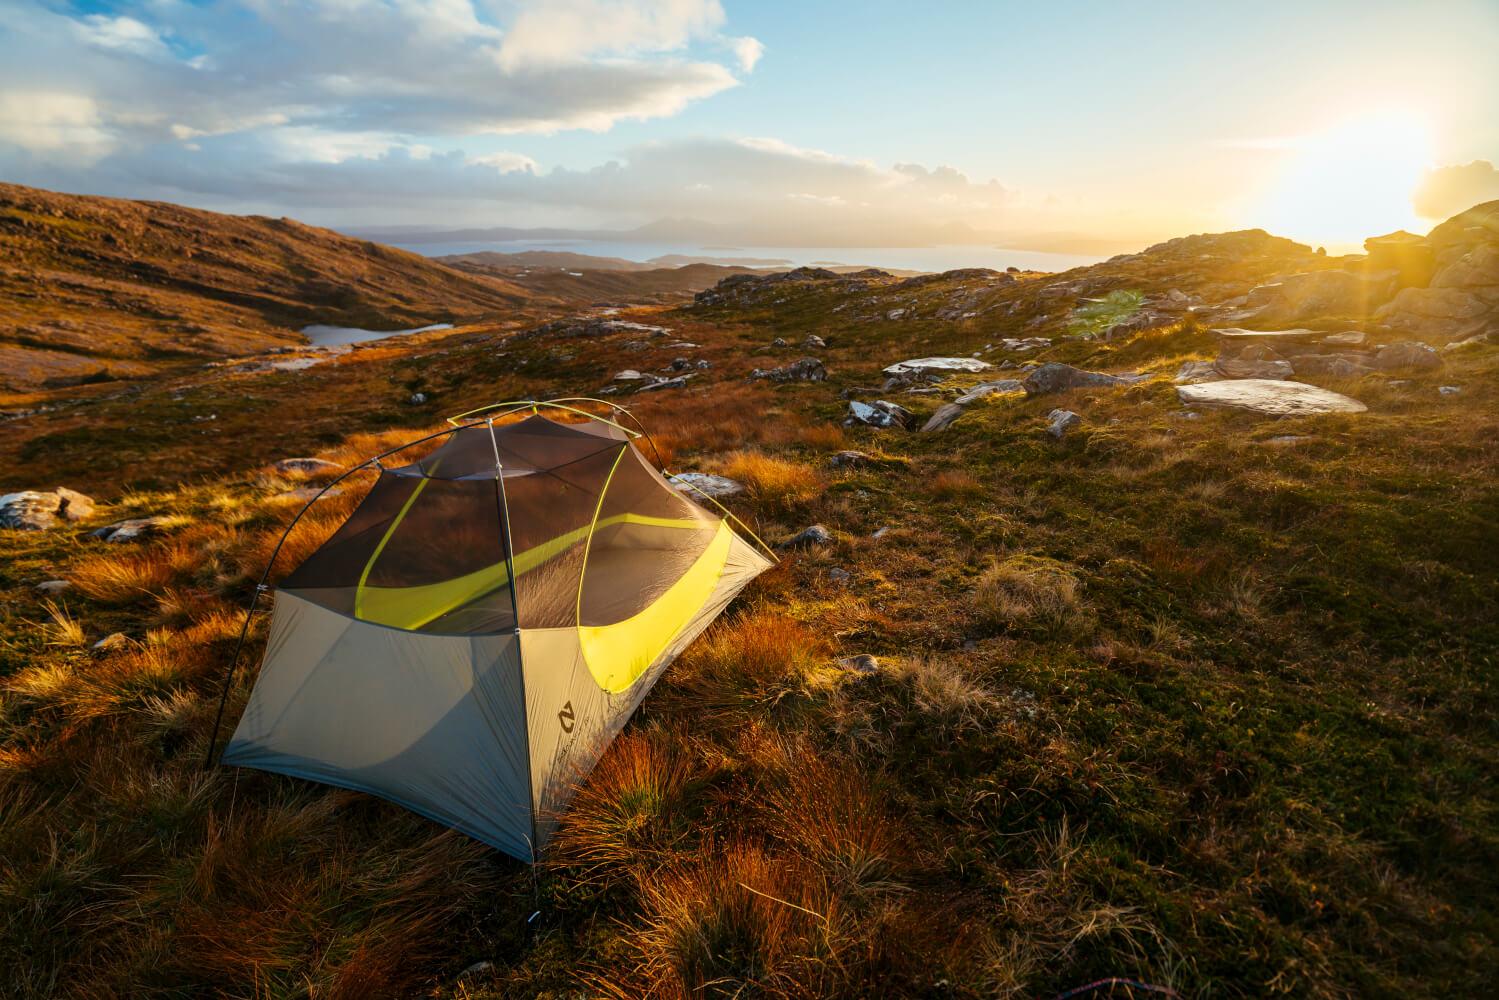 Dragonfly Tent im Sonnenuntergang